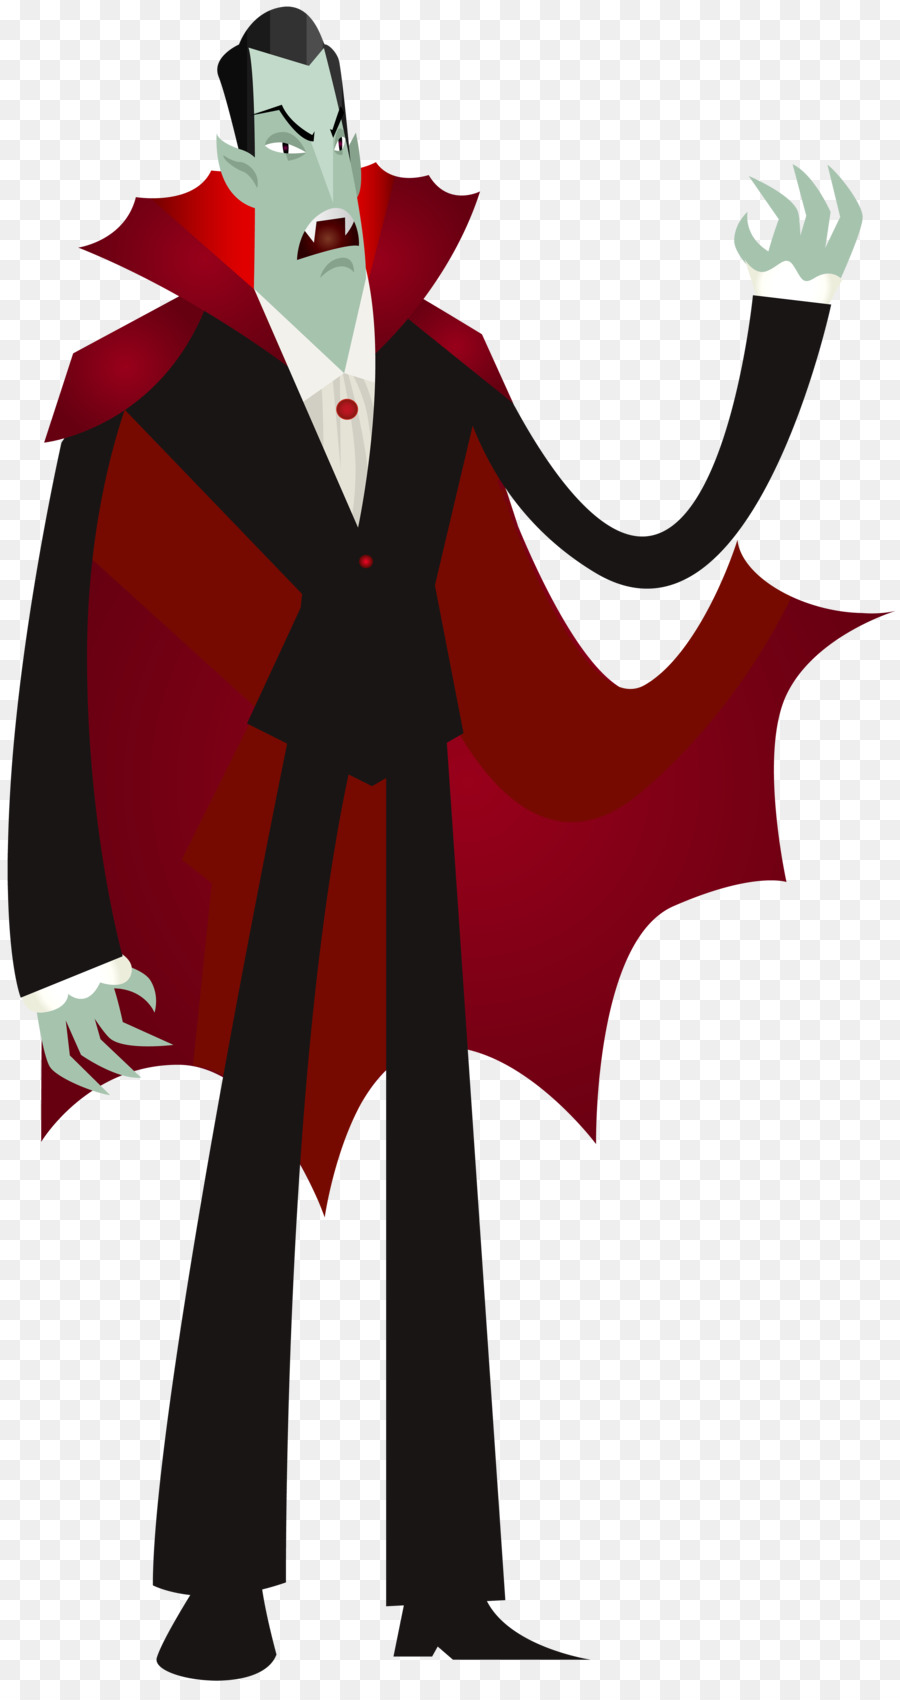 vampire clipart Vampire Clip arttransparent png image.